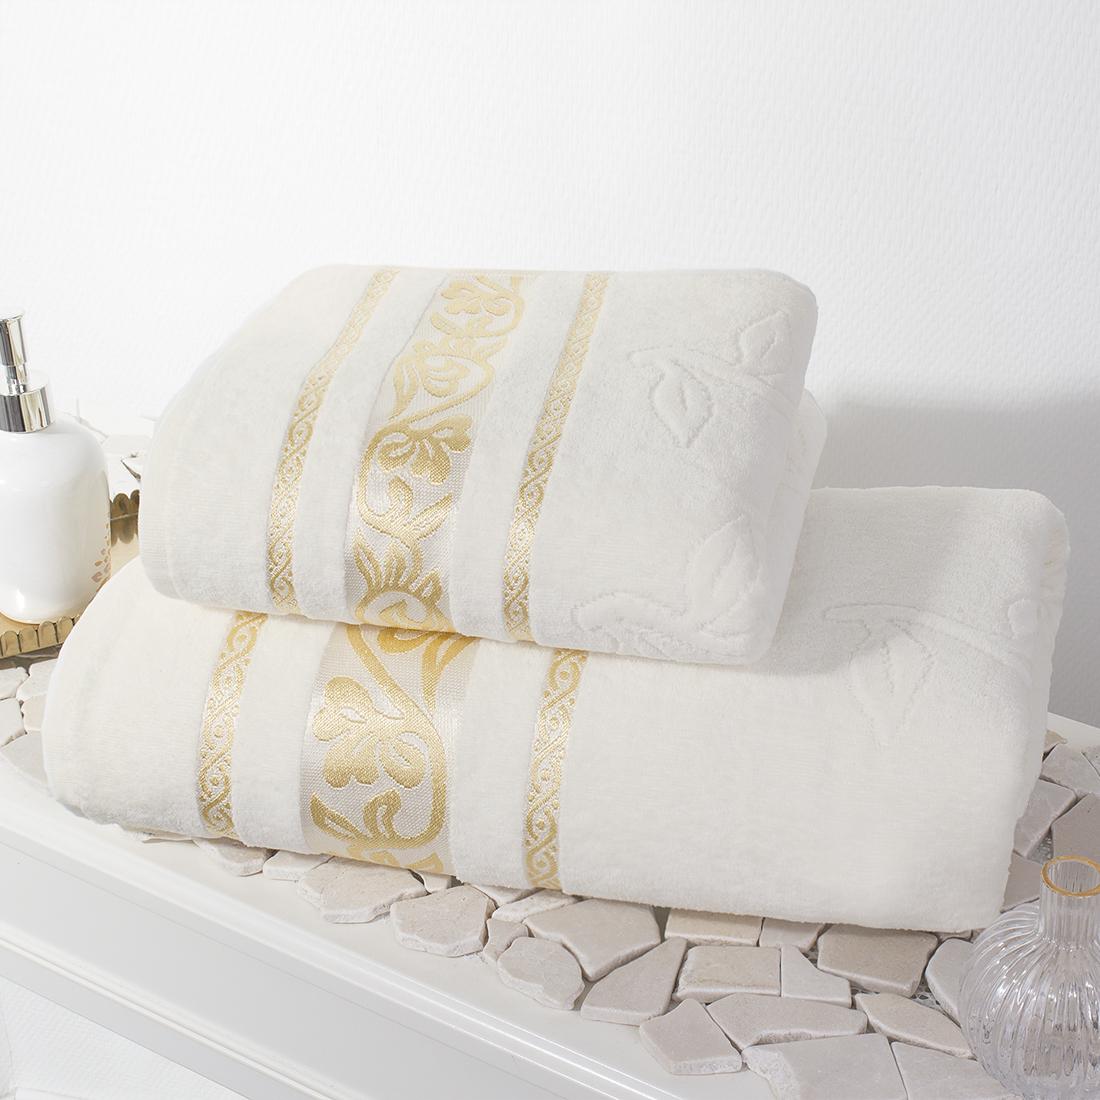 Полотенца Belezza Полотенце Либерти Цвет: Светло-Кремовый (50х80 см,70х130 см)